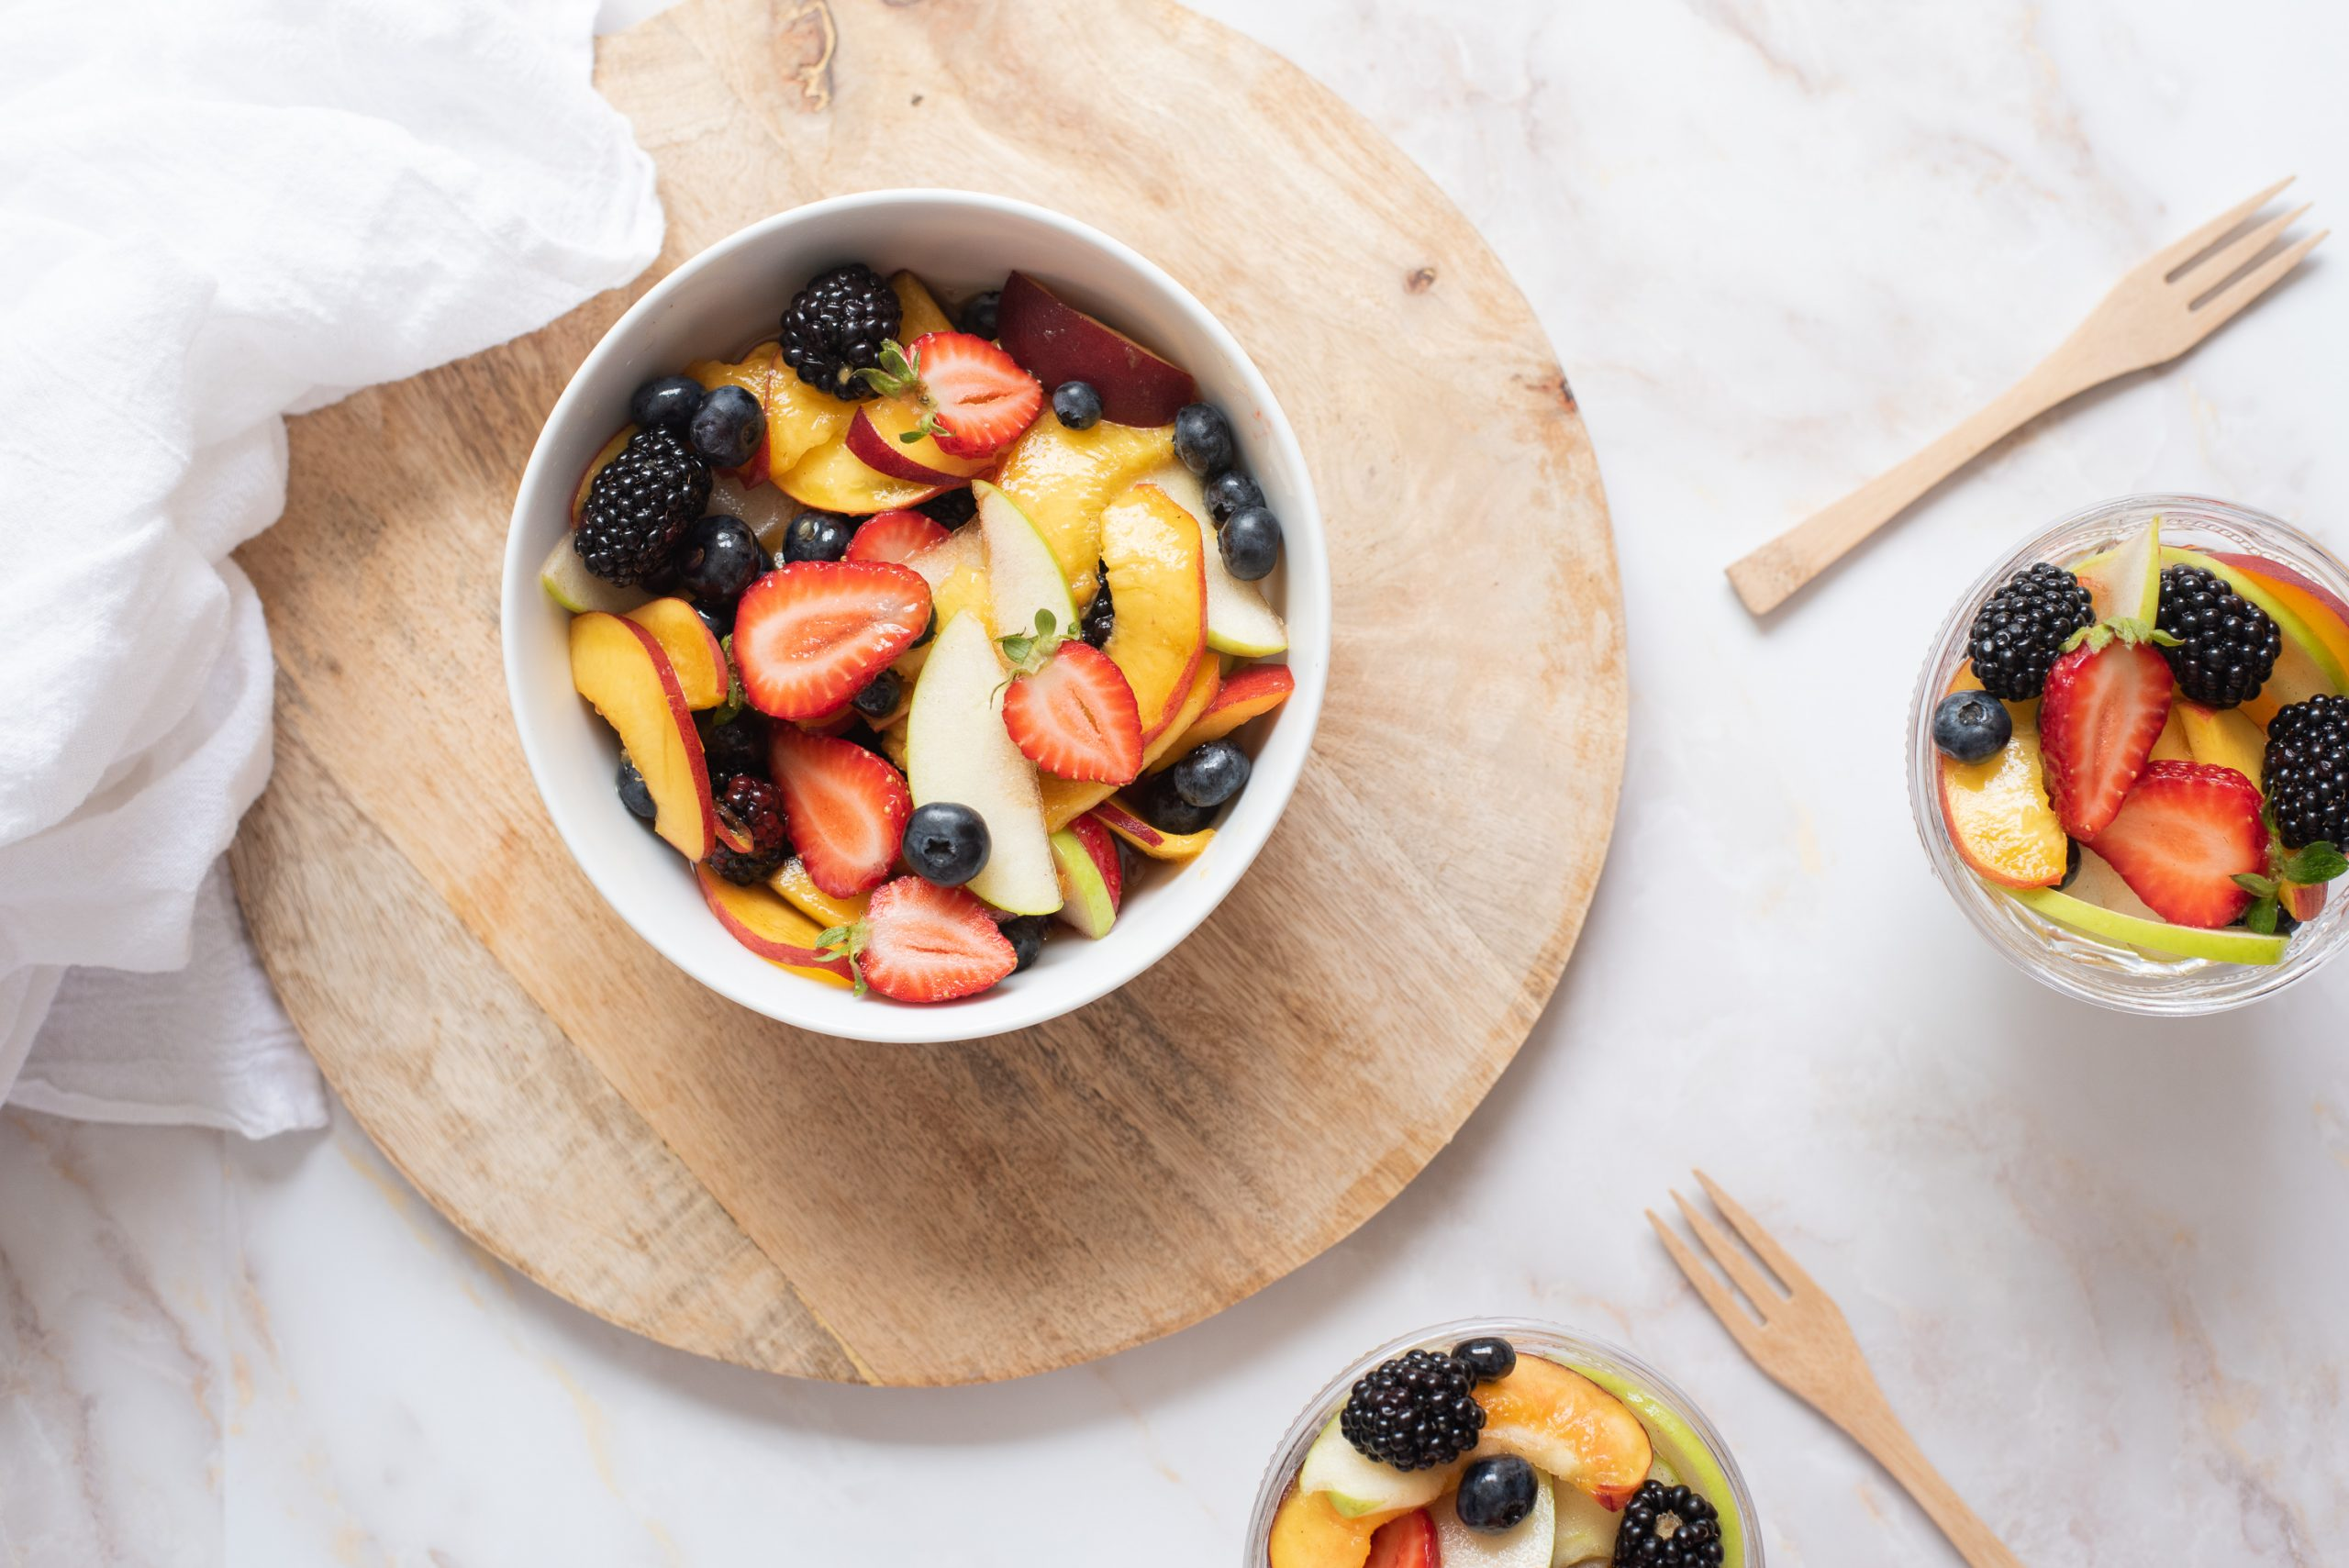 salade-de-fruits-sirop-jus-de-pommes-wooloo_top